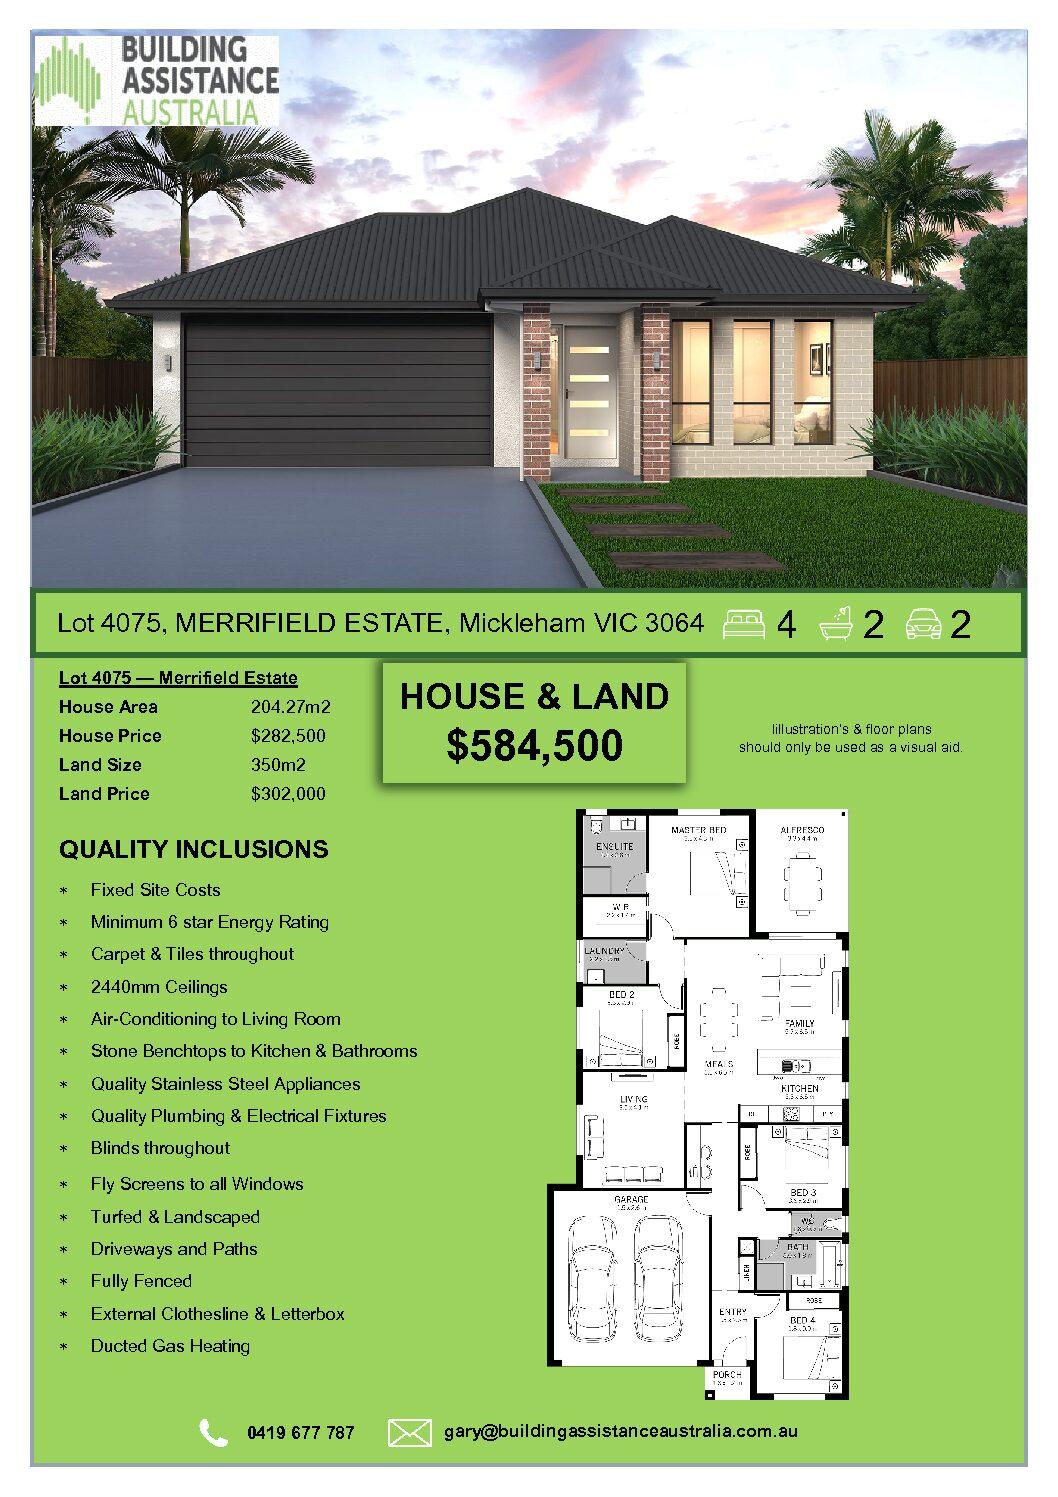 Lot 4075, Merrifield Estate, Mickleham